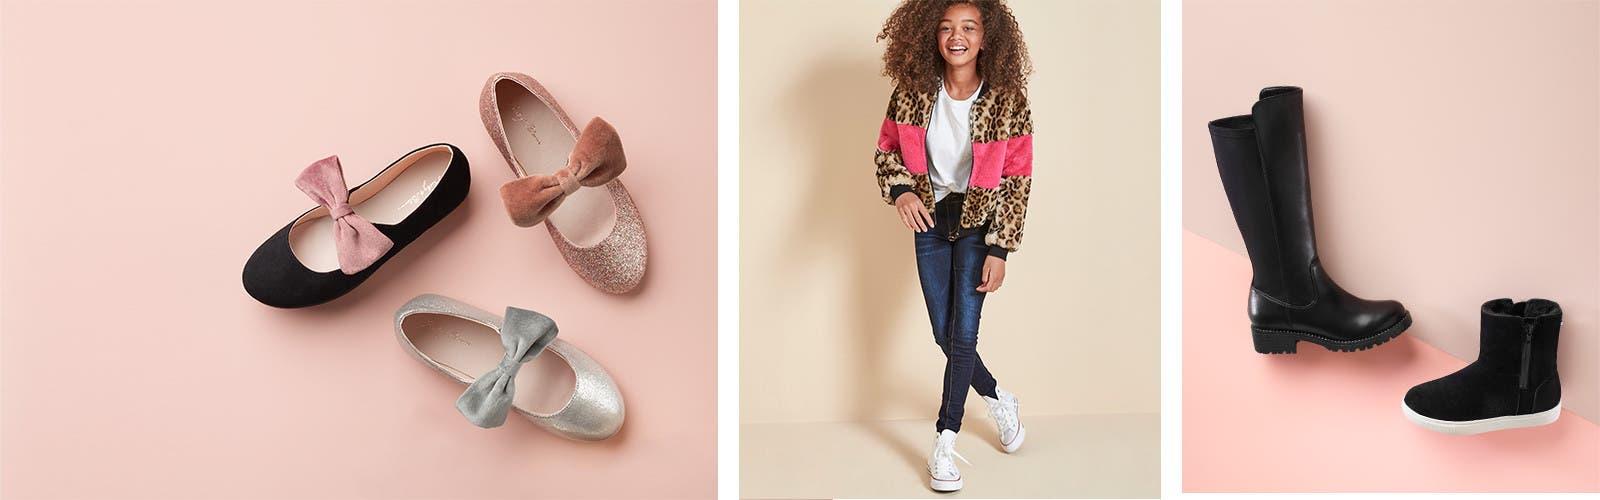 Girlsu0027 shoes for all her moods Girlsu0027